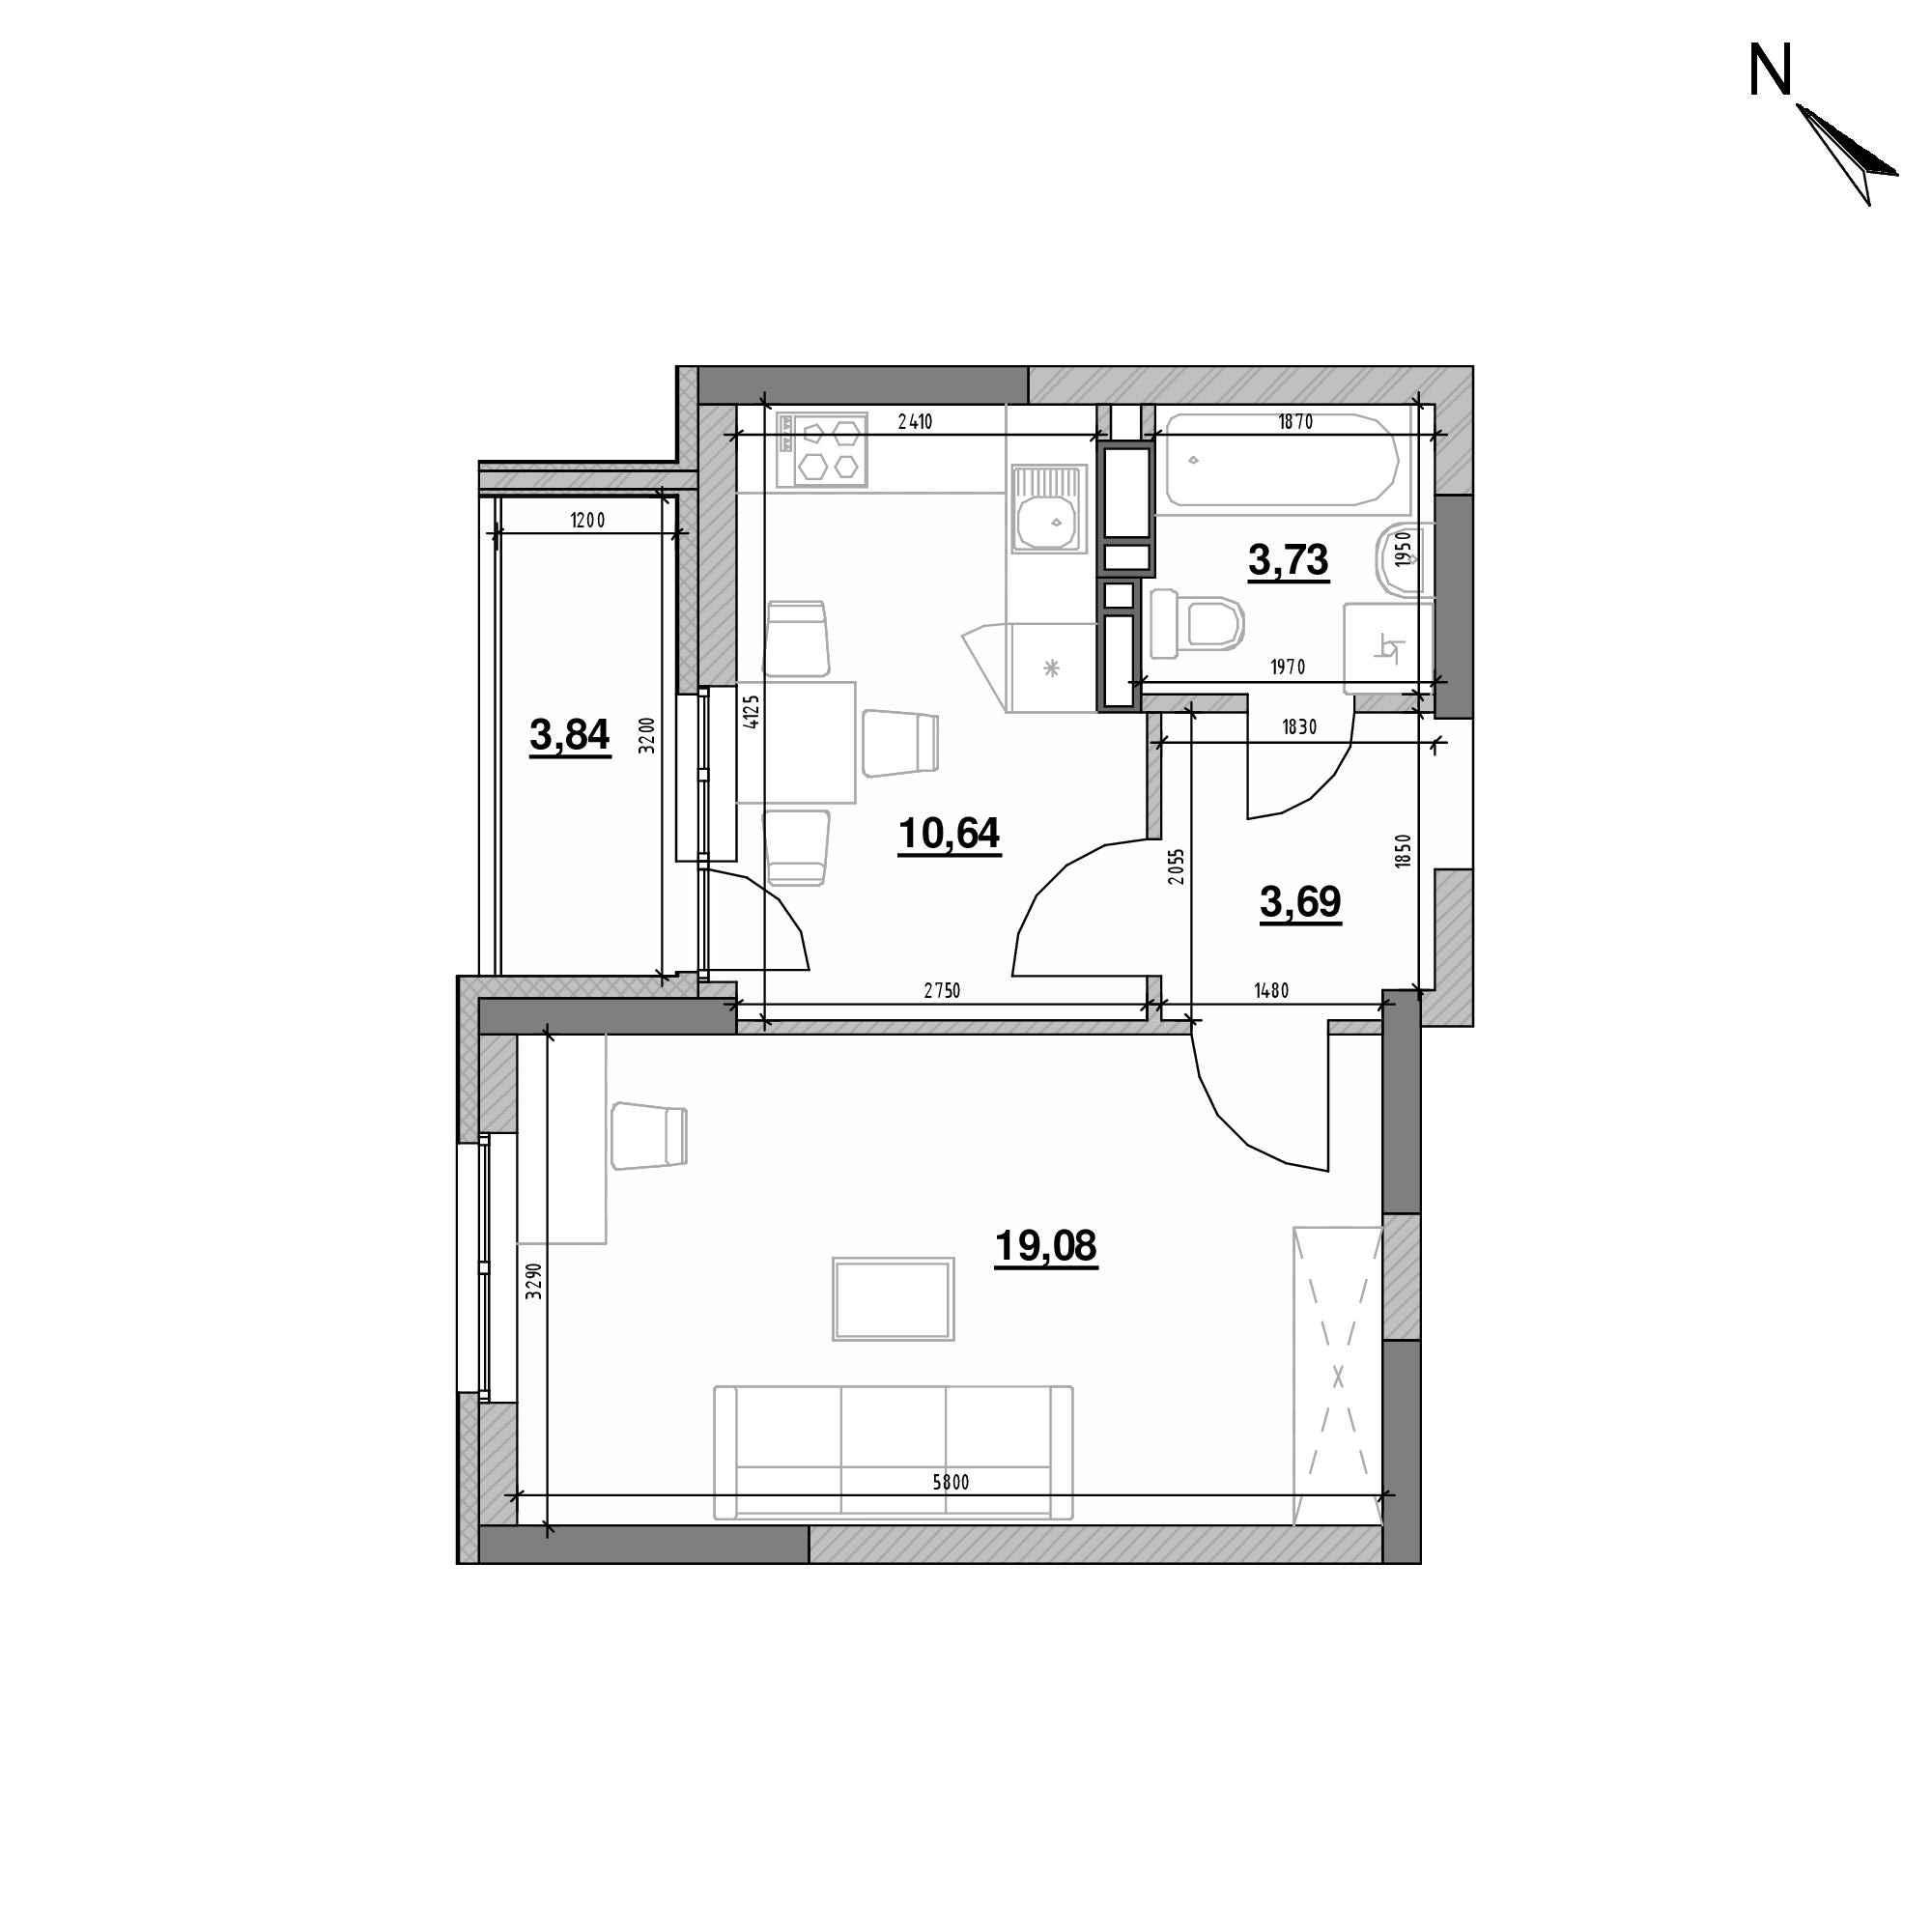 ЖК Оk'Land: планування 1-кімнатної квартири, №248, 40.98 м<sup>2</sup>